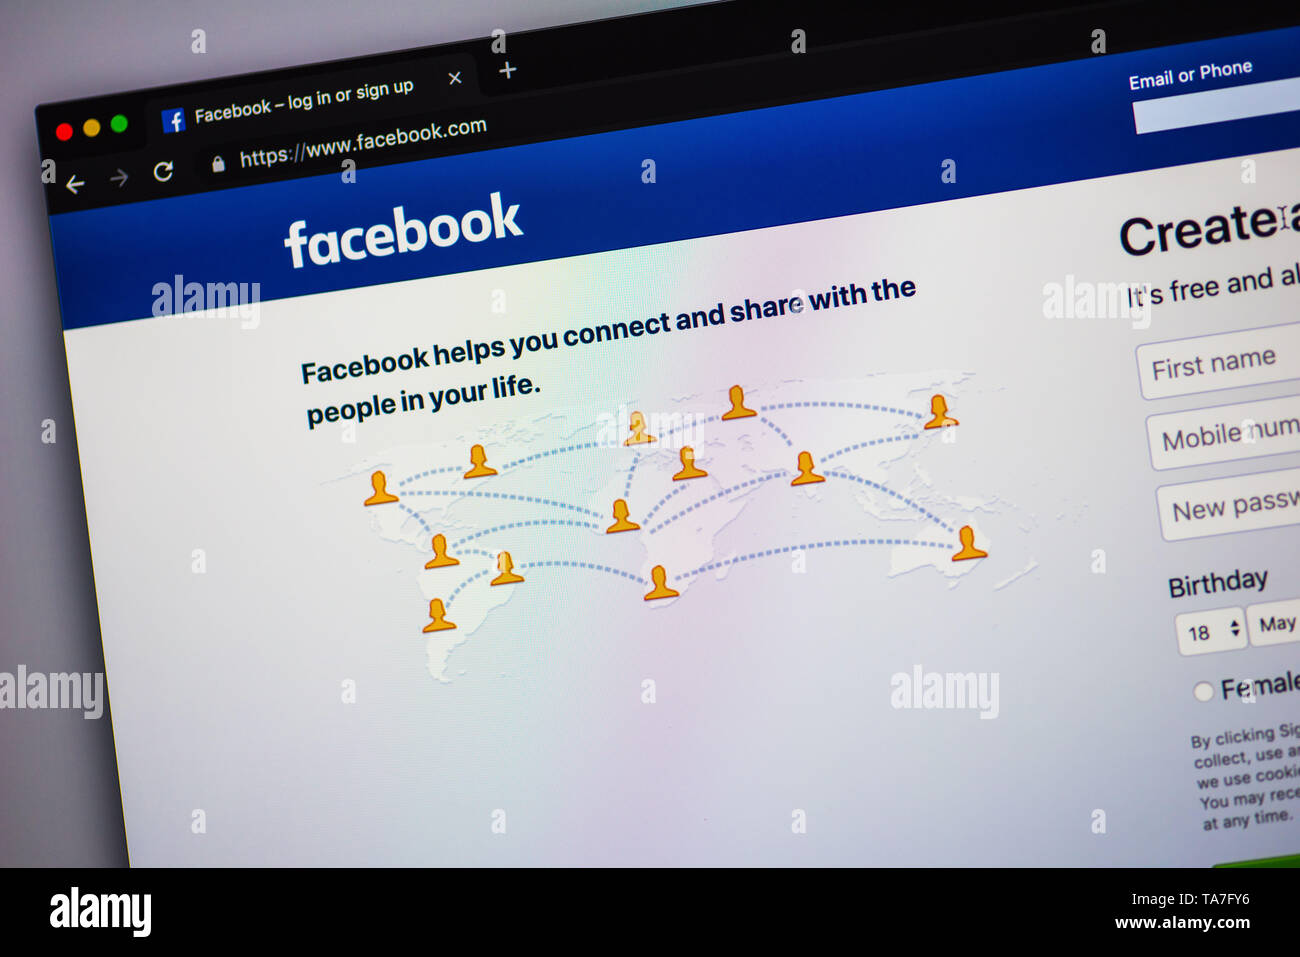 Facebook login page Stock Photo: 247257898 - Alamy